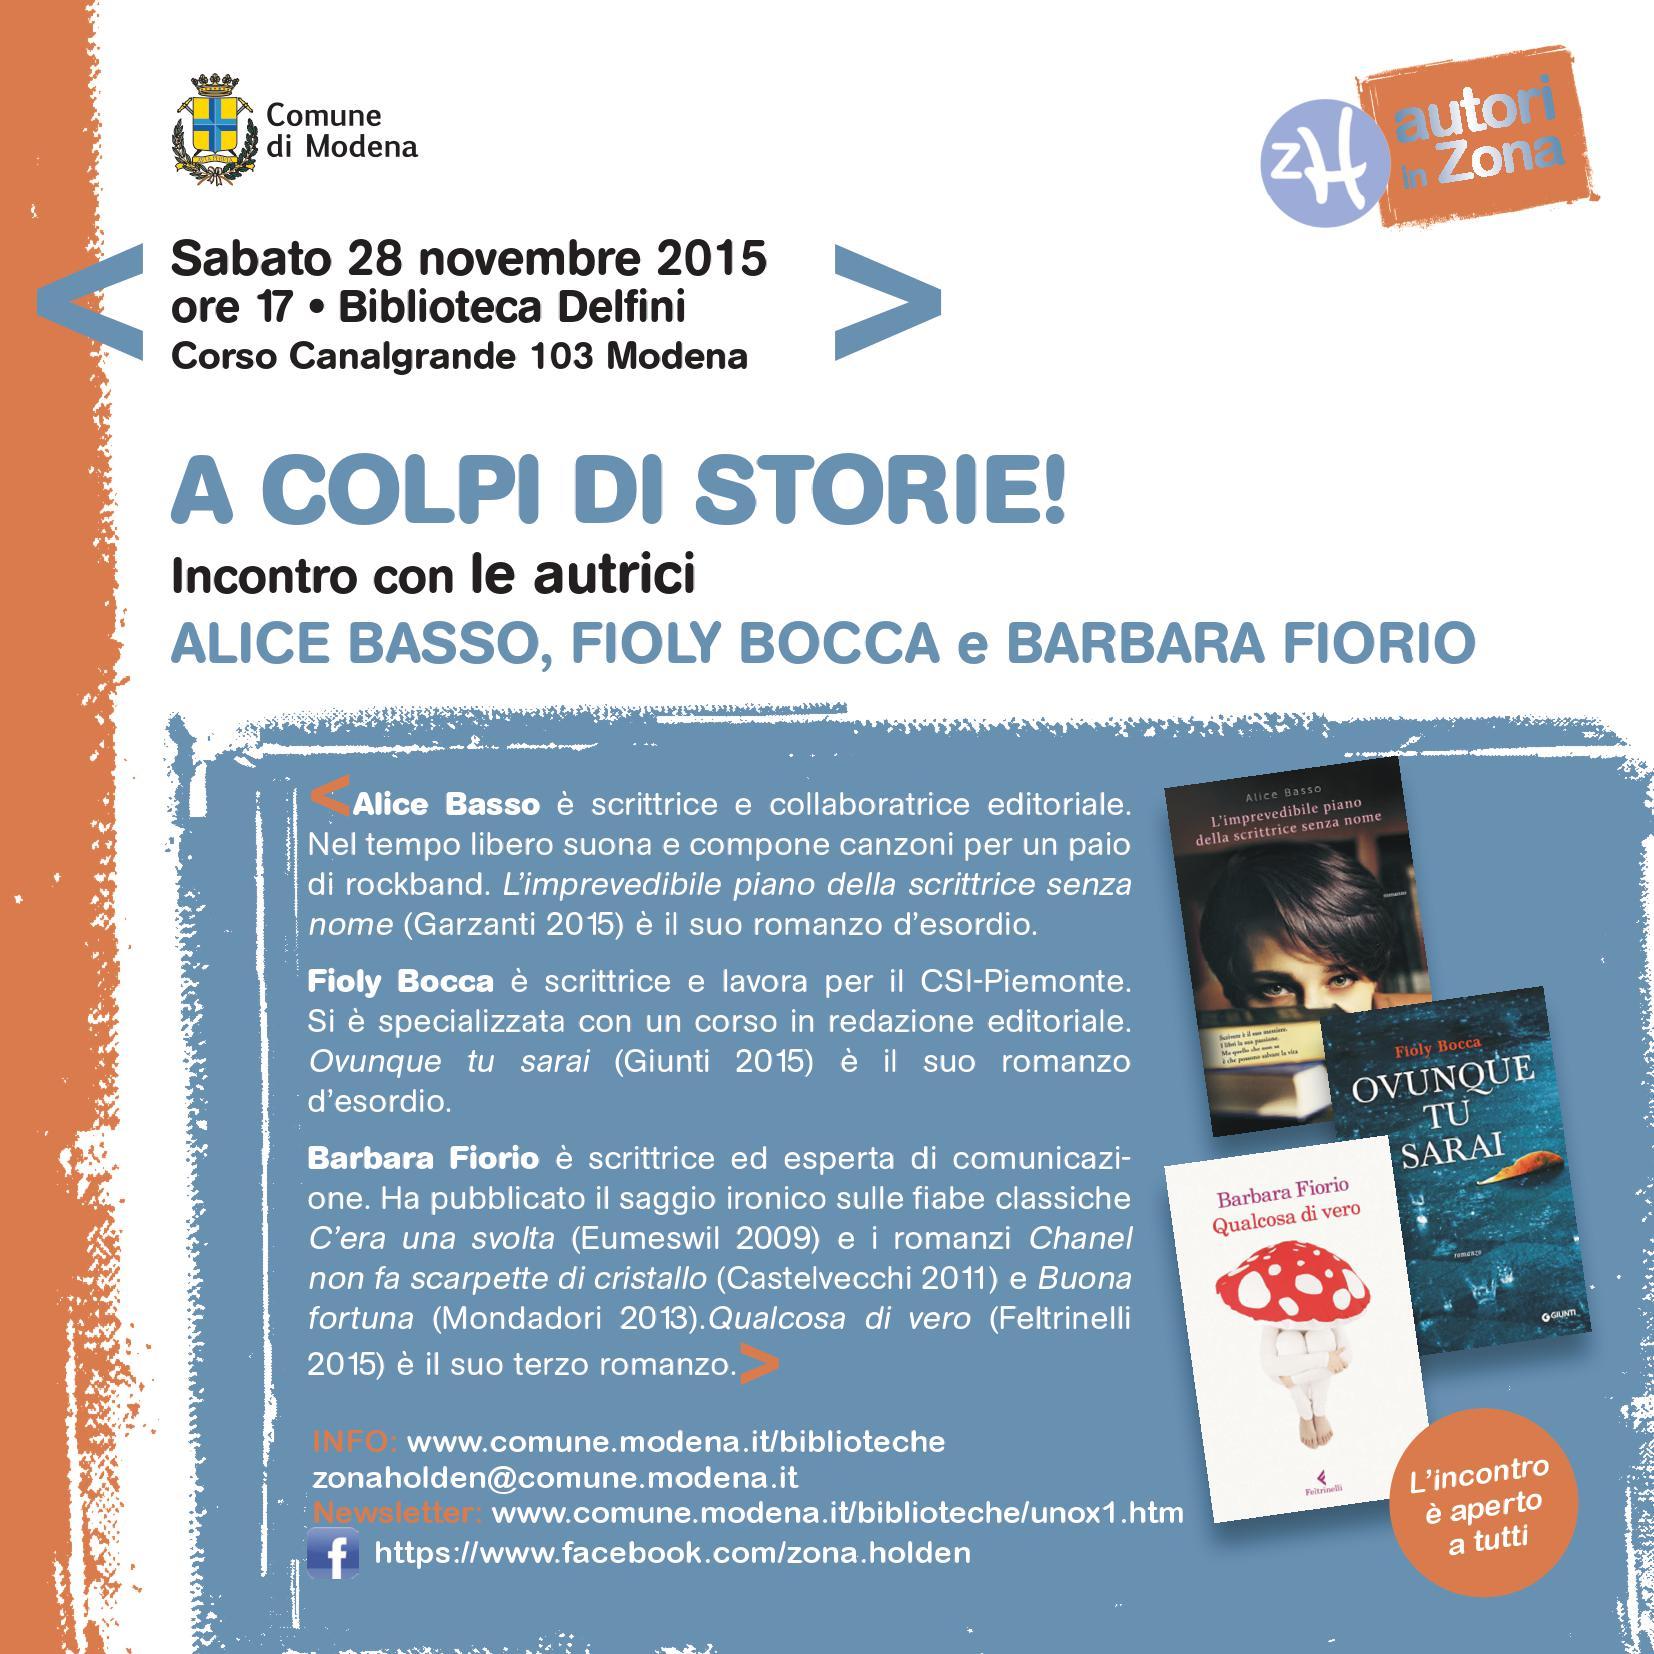 28 novembre a Modena